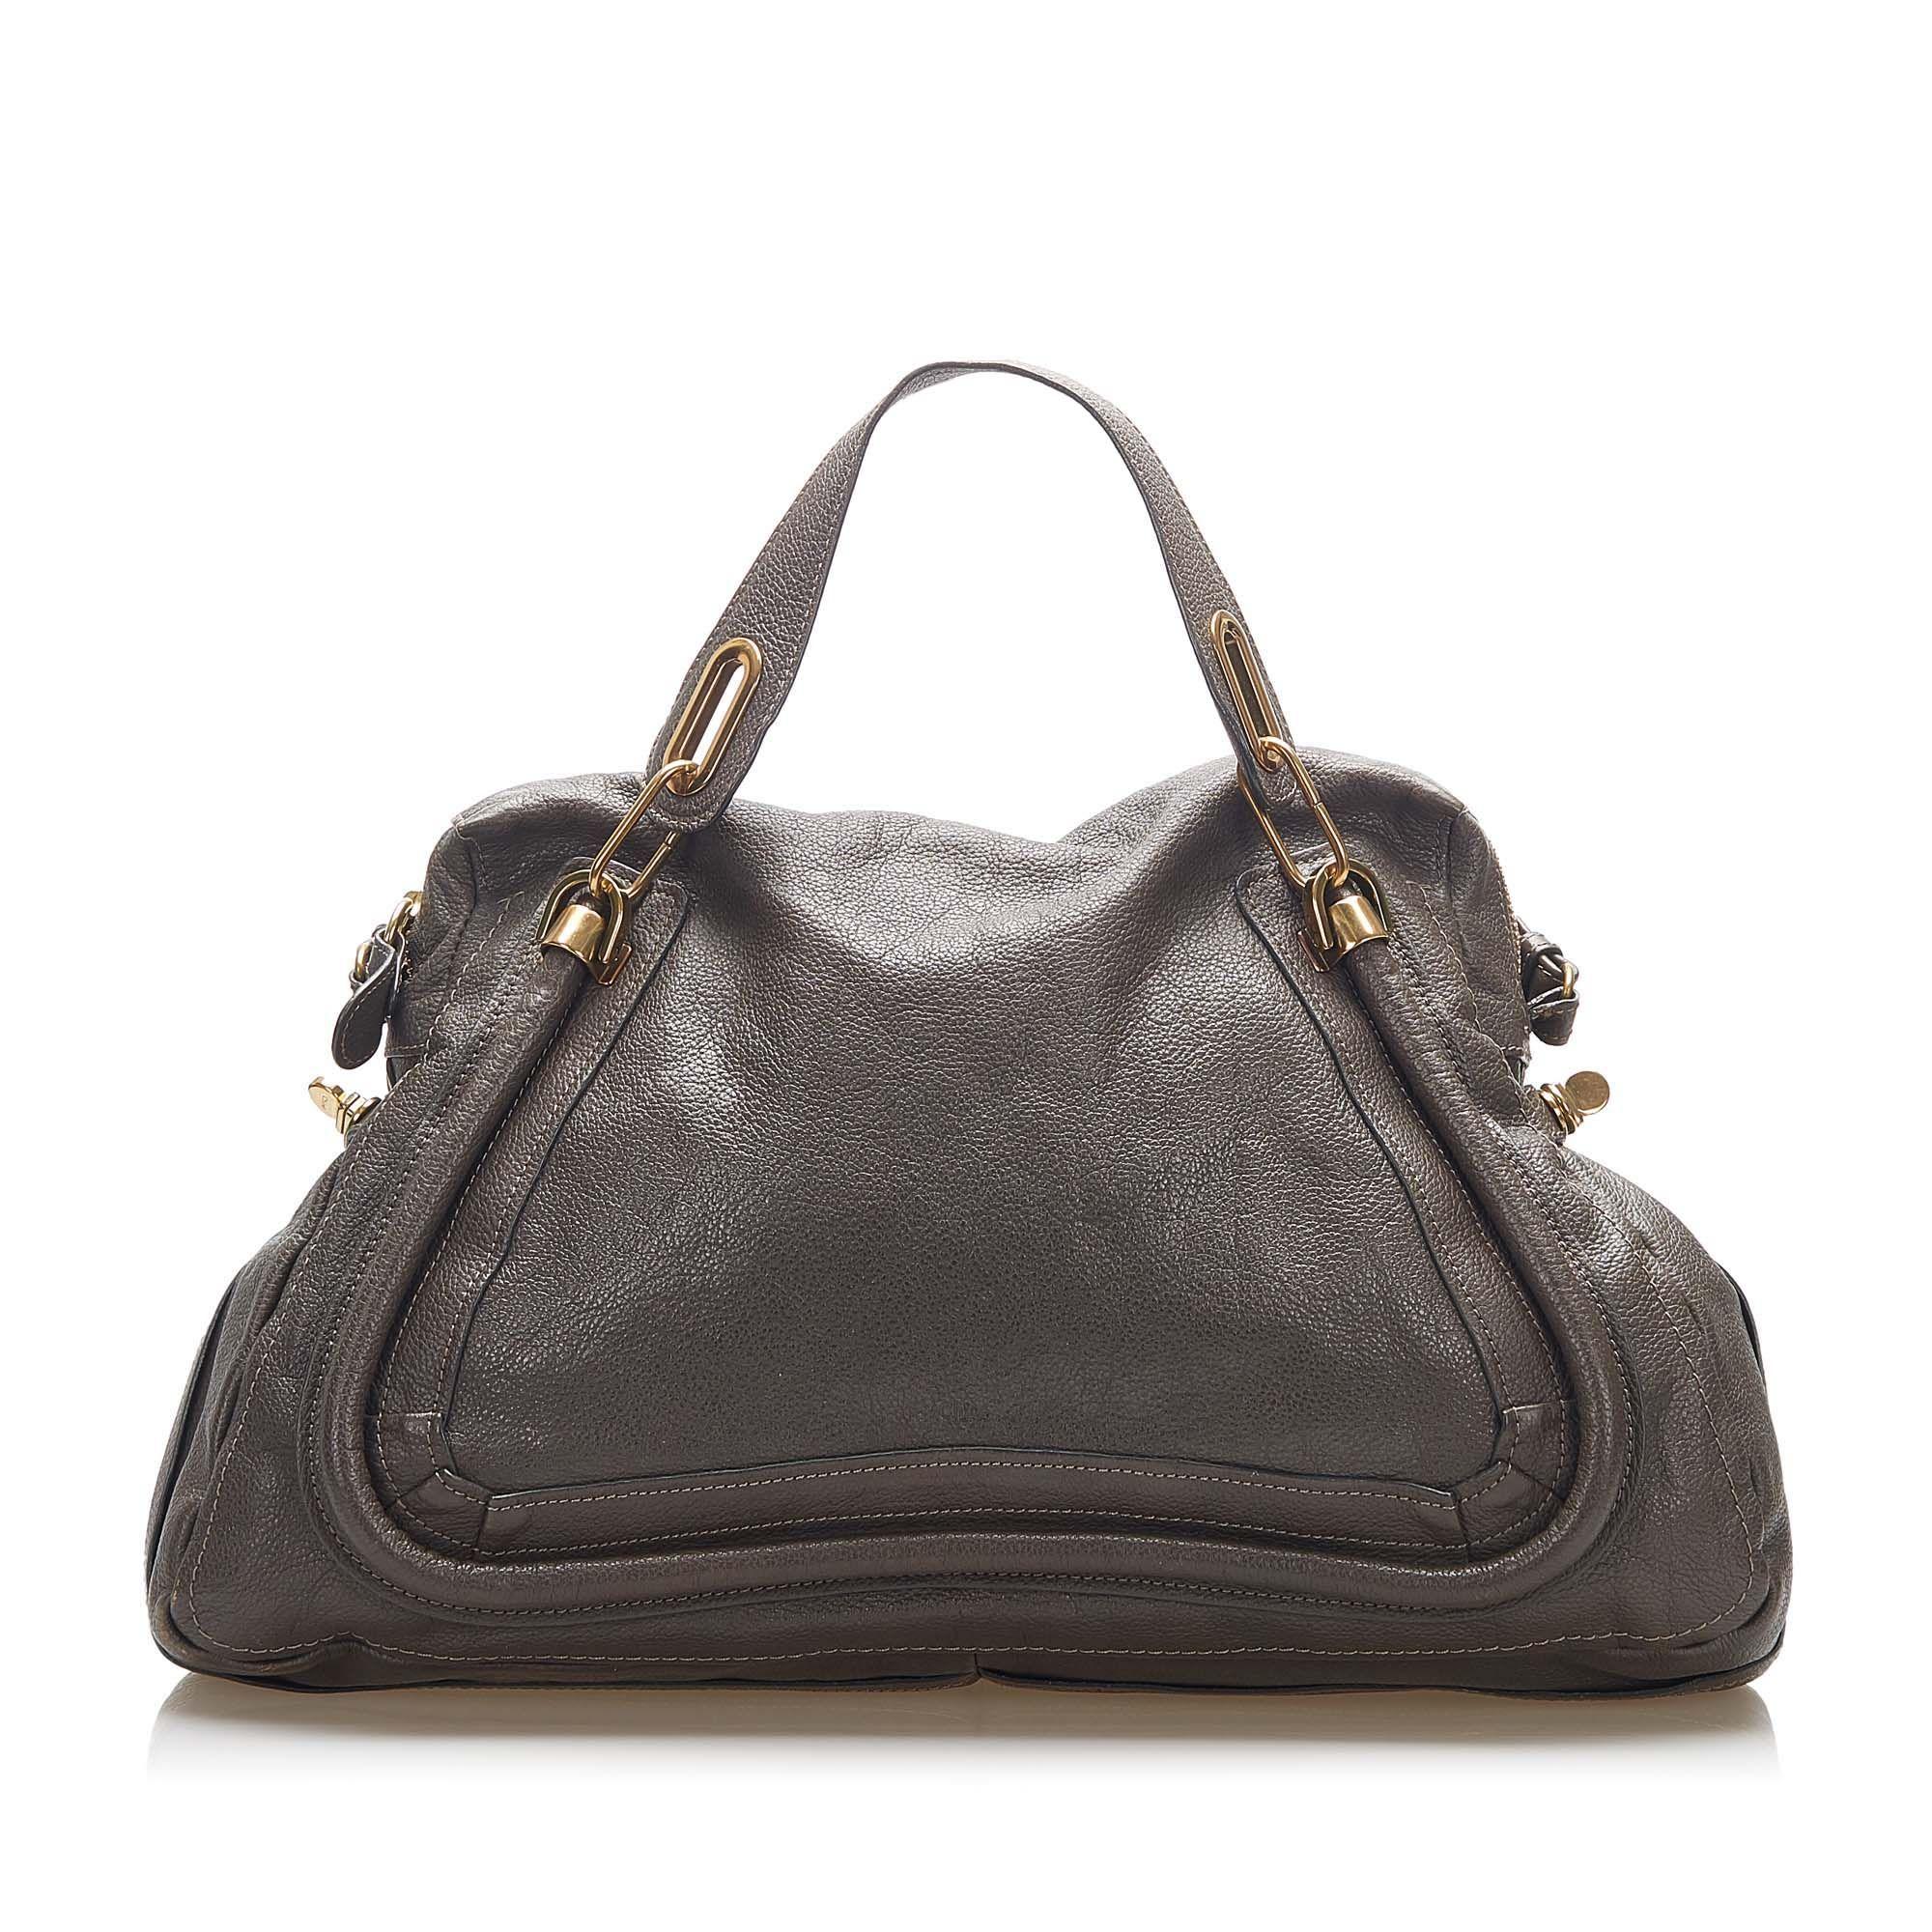 Vintage Chloe Paraty Leather Satchel Gray